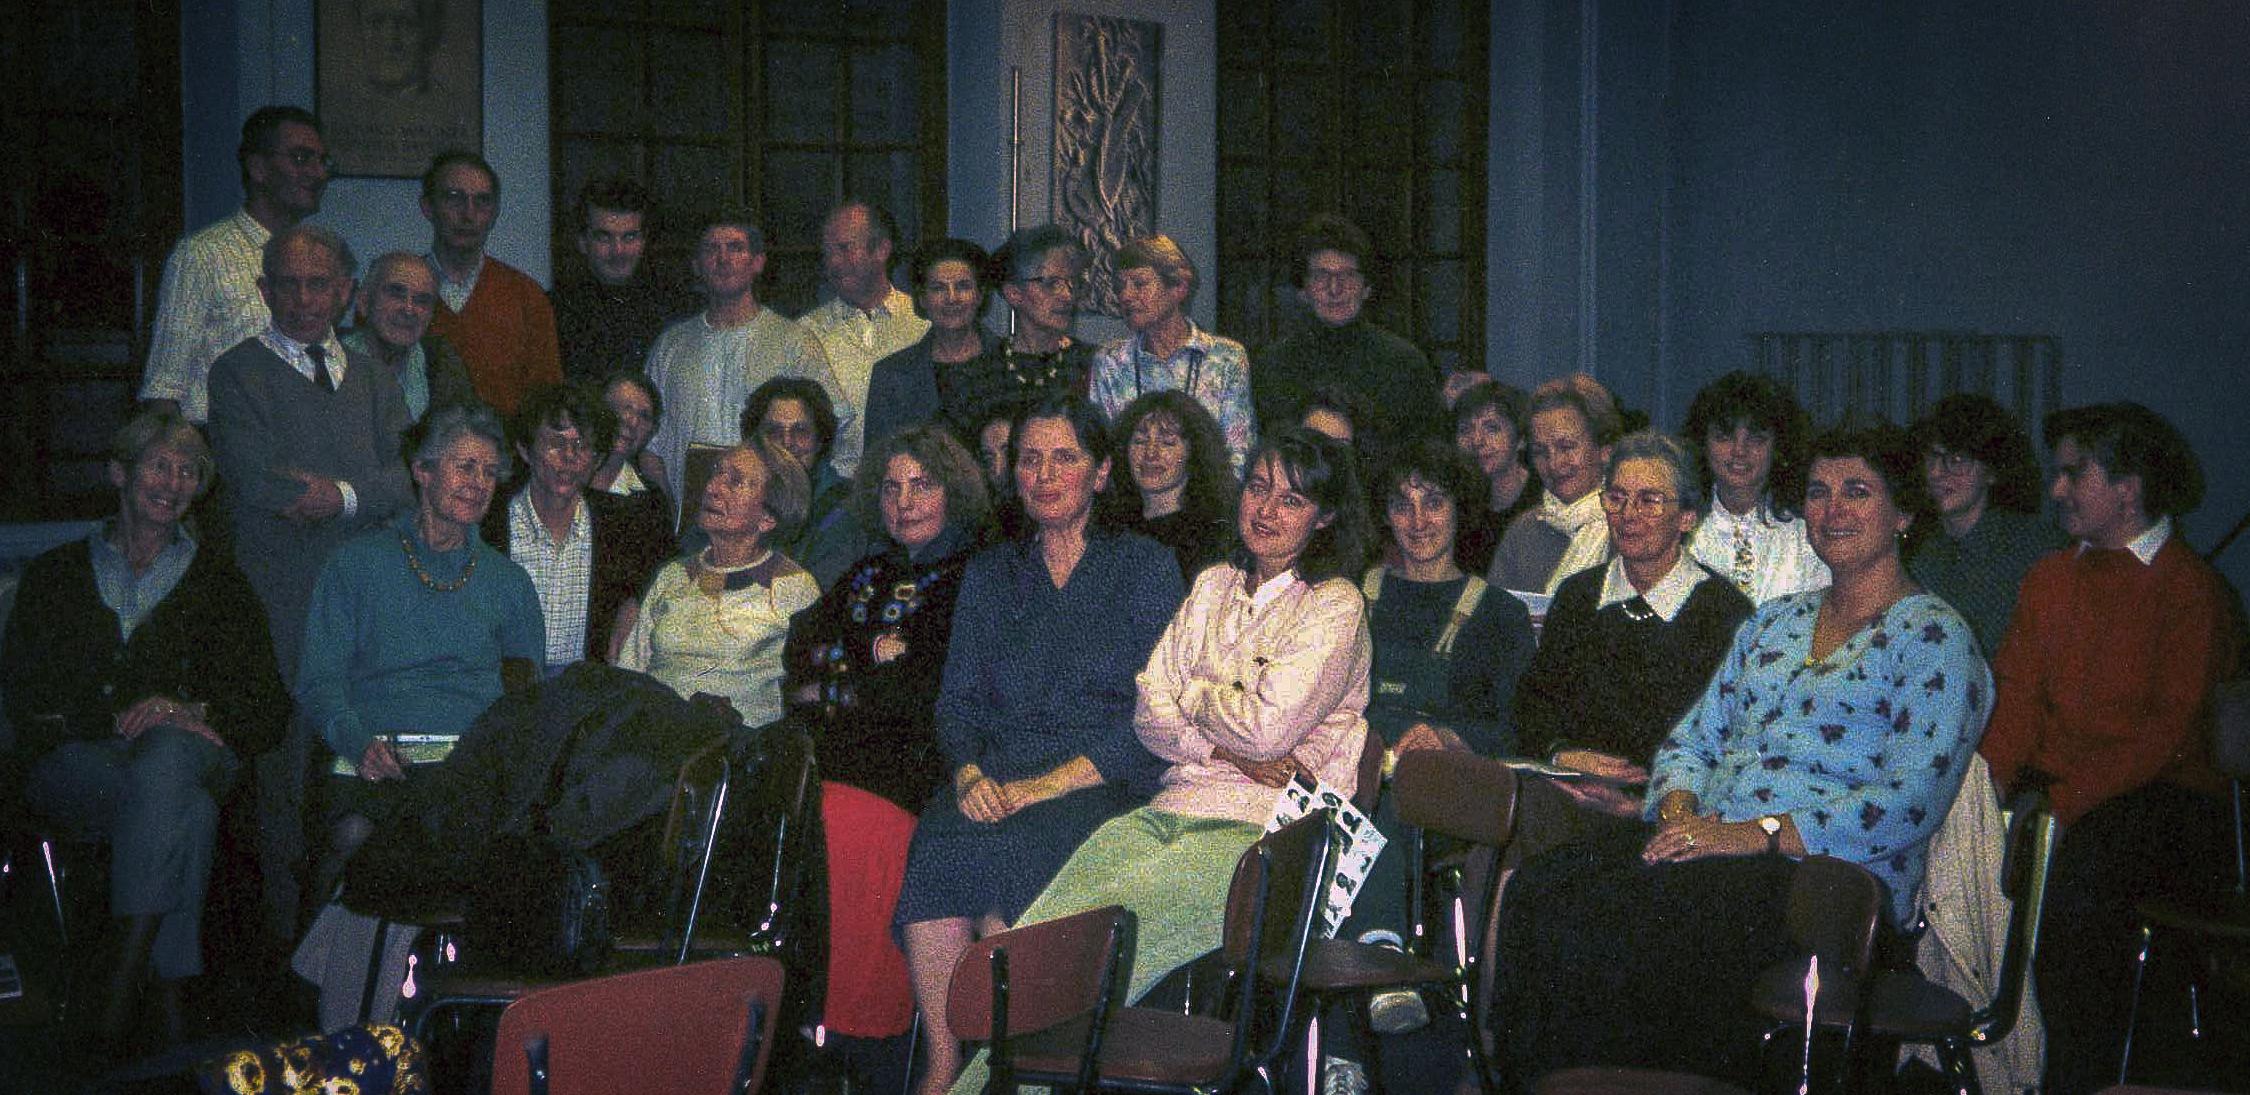 Atelier Negro spirituals, MACLY - 1991